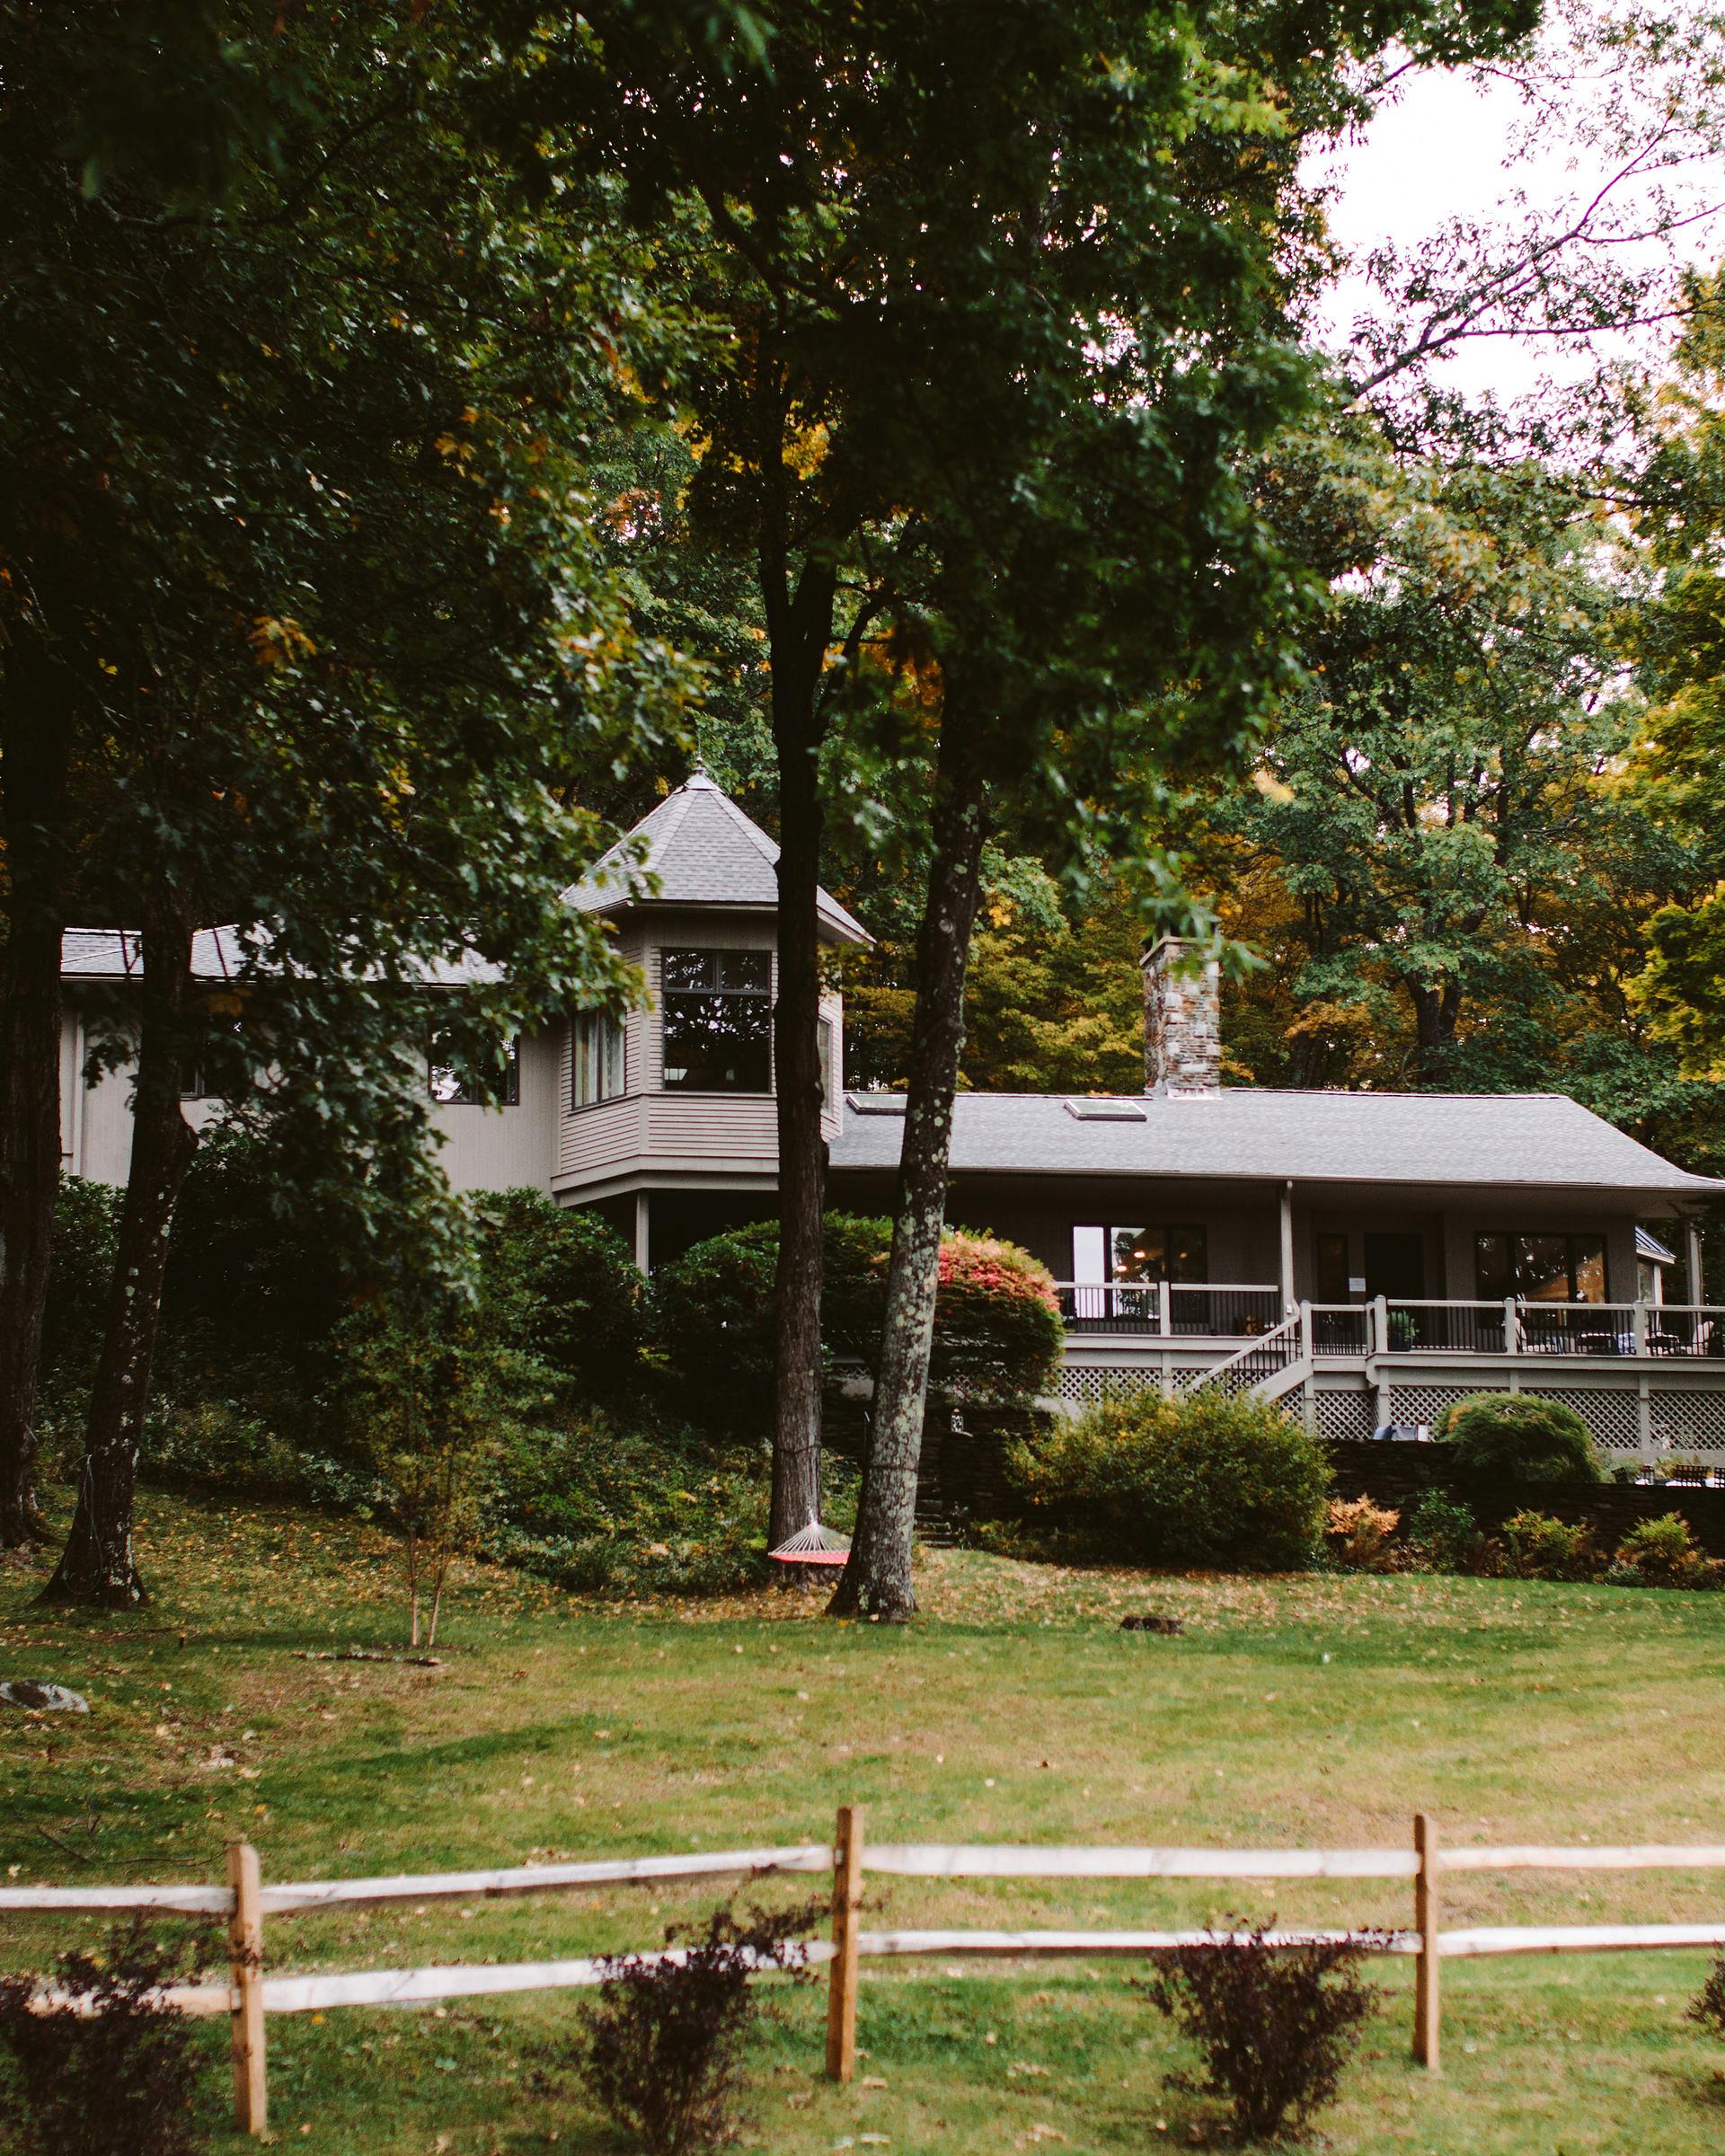 rivka aaron wedding inn venue outdoor view